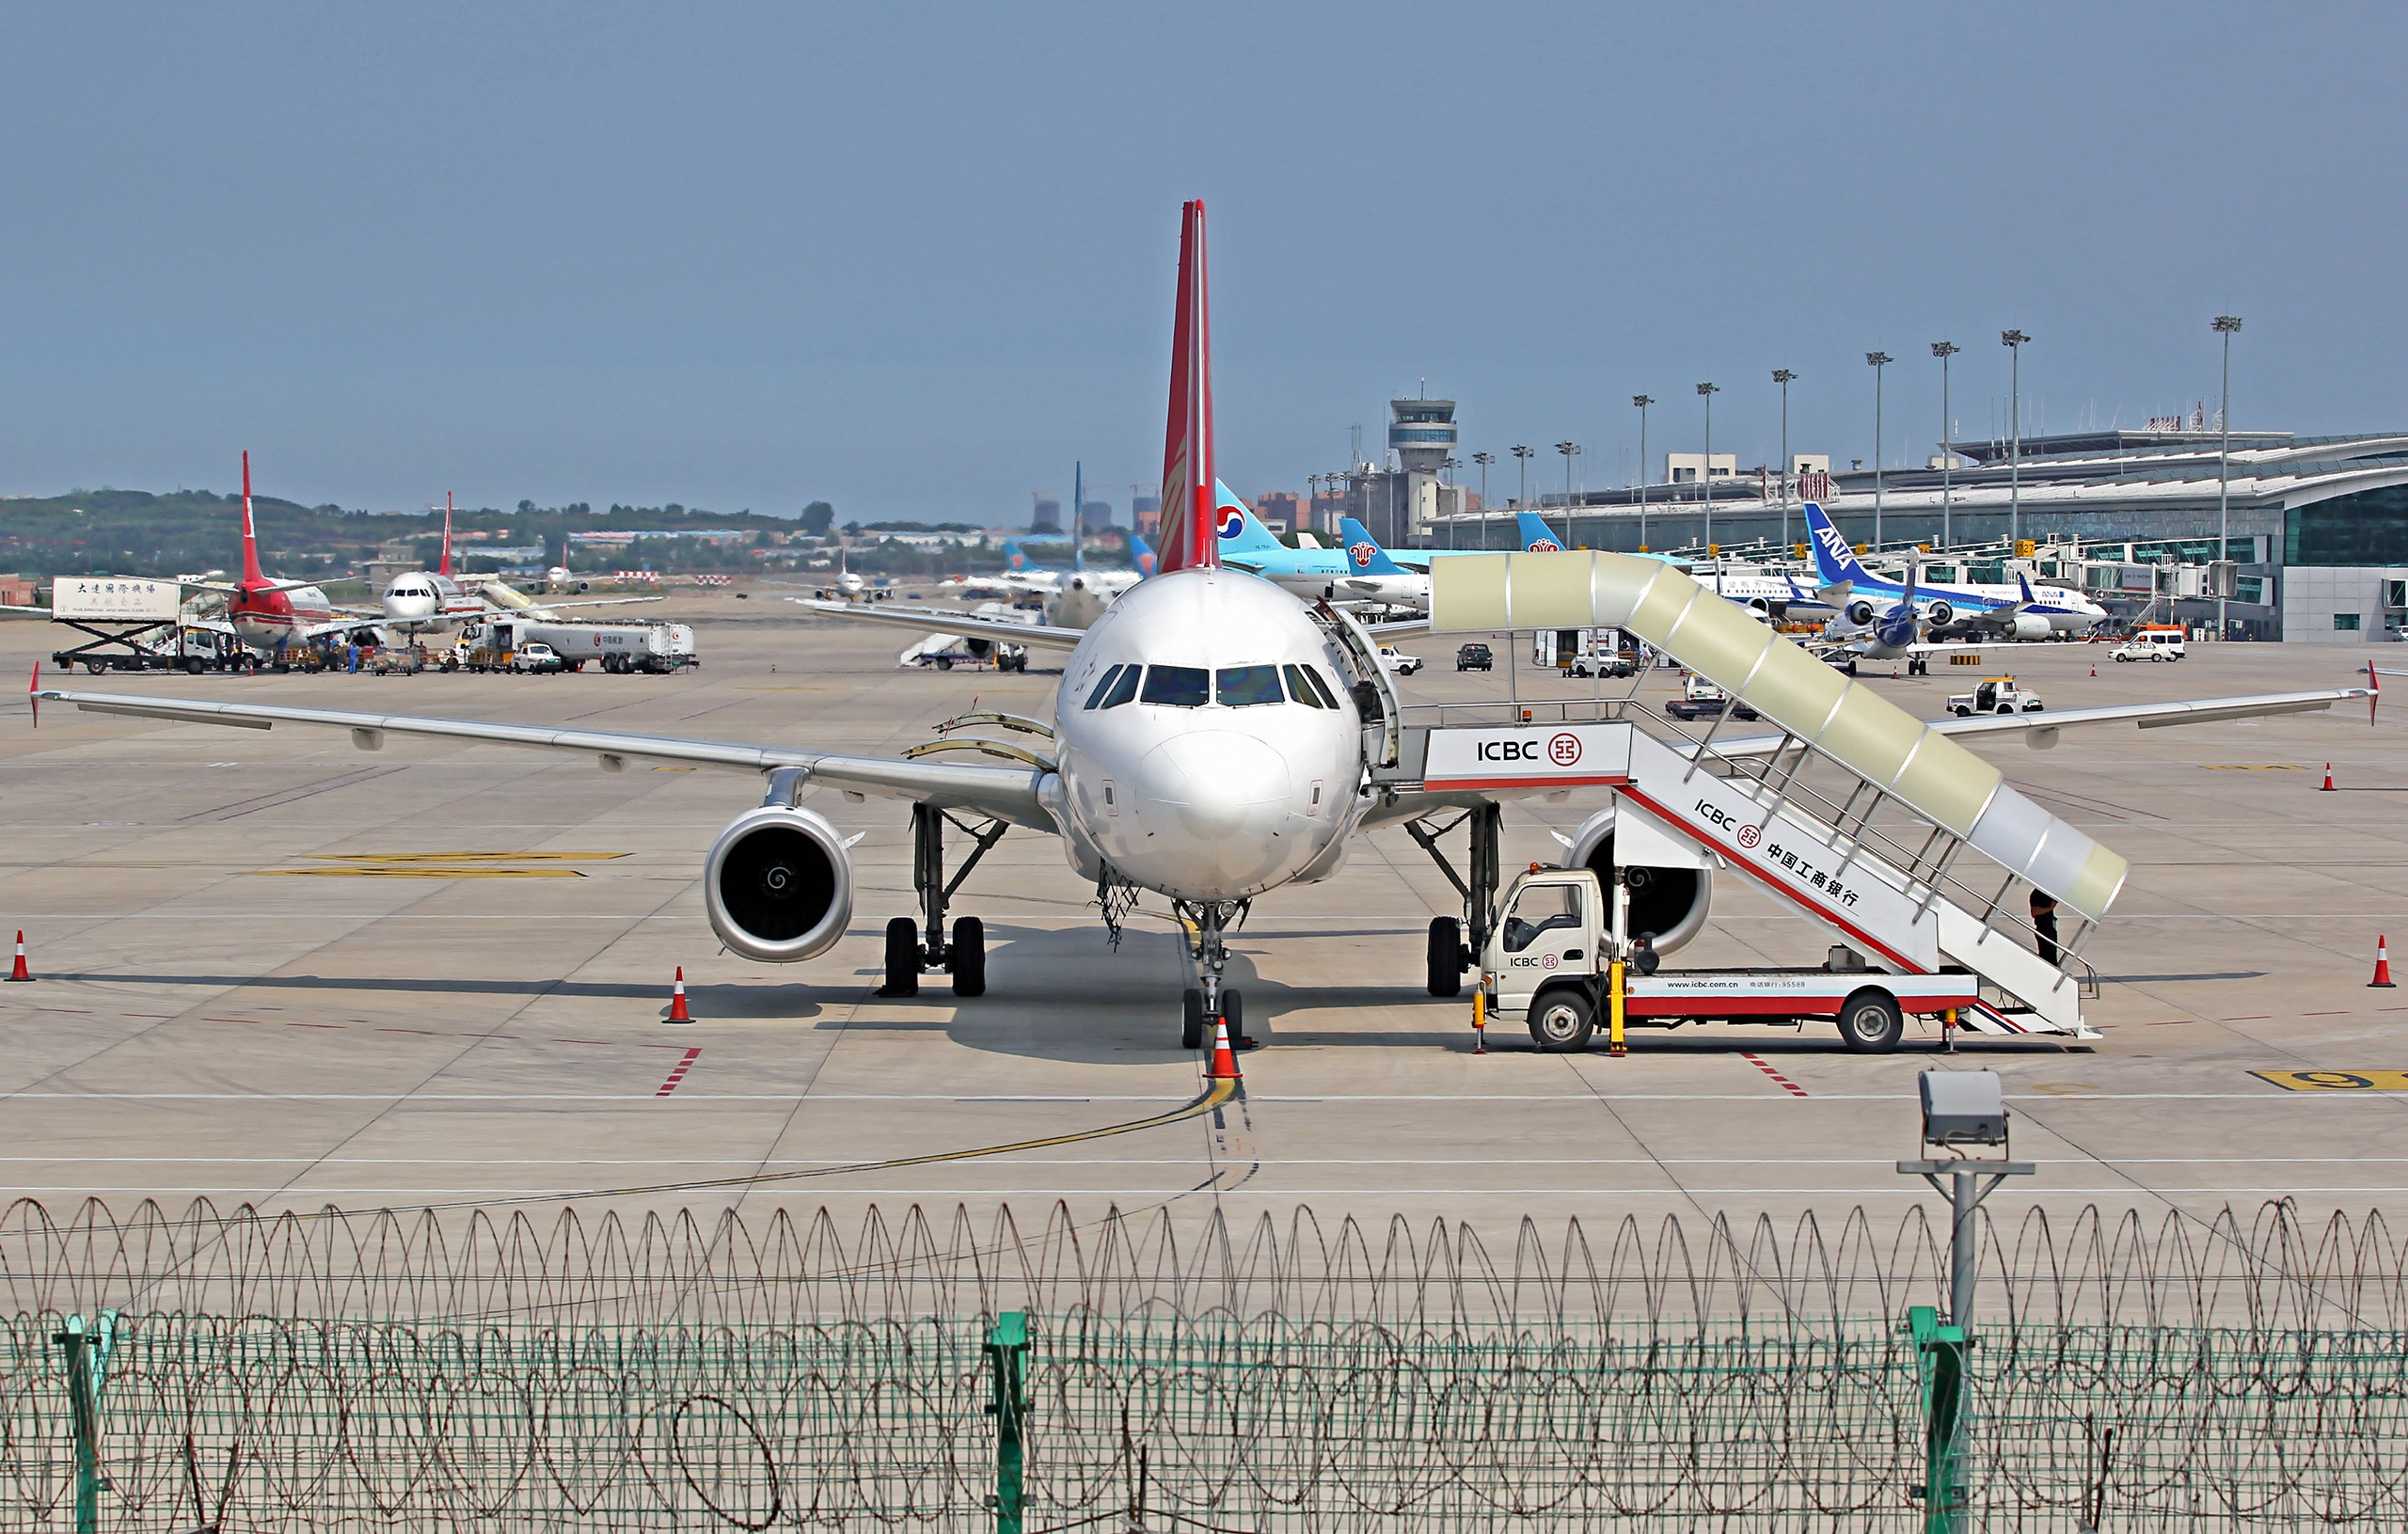 Re:[原创][DLC]...窄体机...2560x1707}Pix AIRBUS A320-200 B-9909 中国大连周水子国际机场